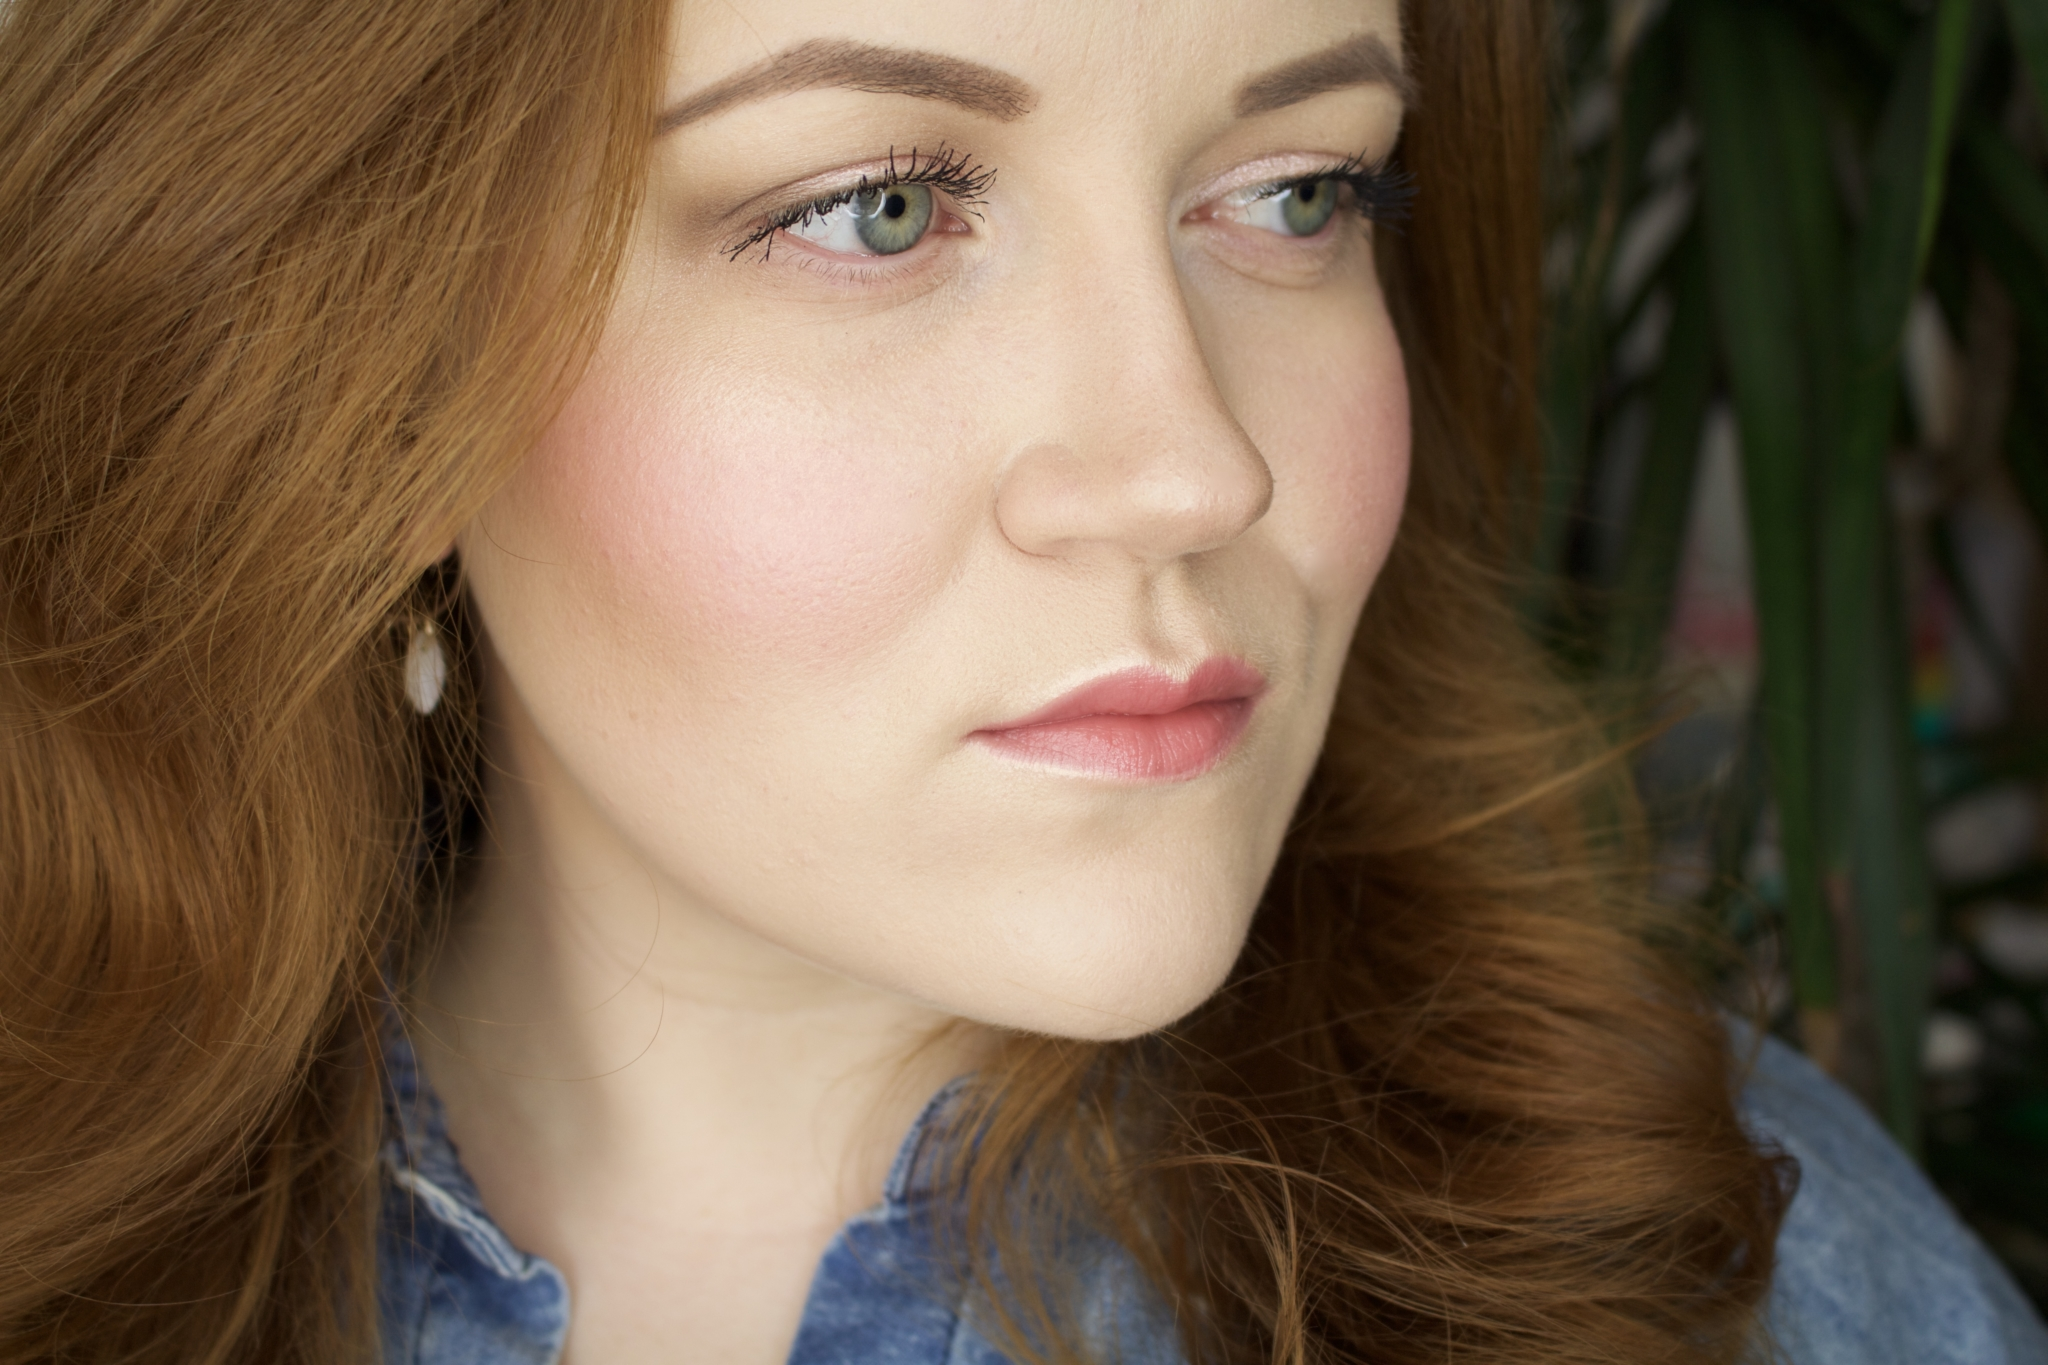 Glowy Teint - Mein Oster Make-up Look: peach & glowy mit Lancome & YSL - Beauty Blog Leipzig